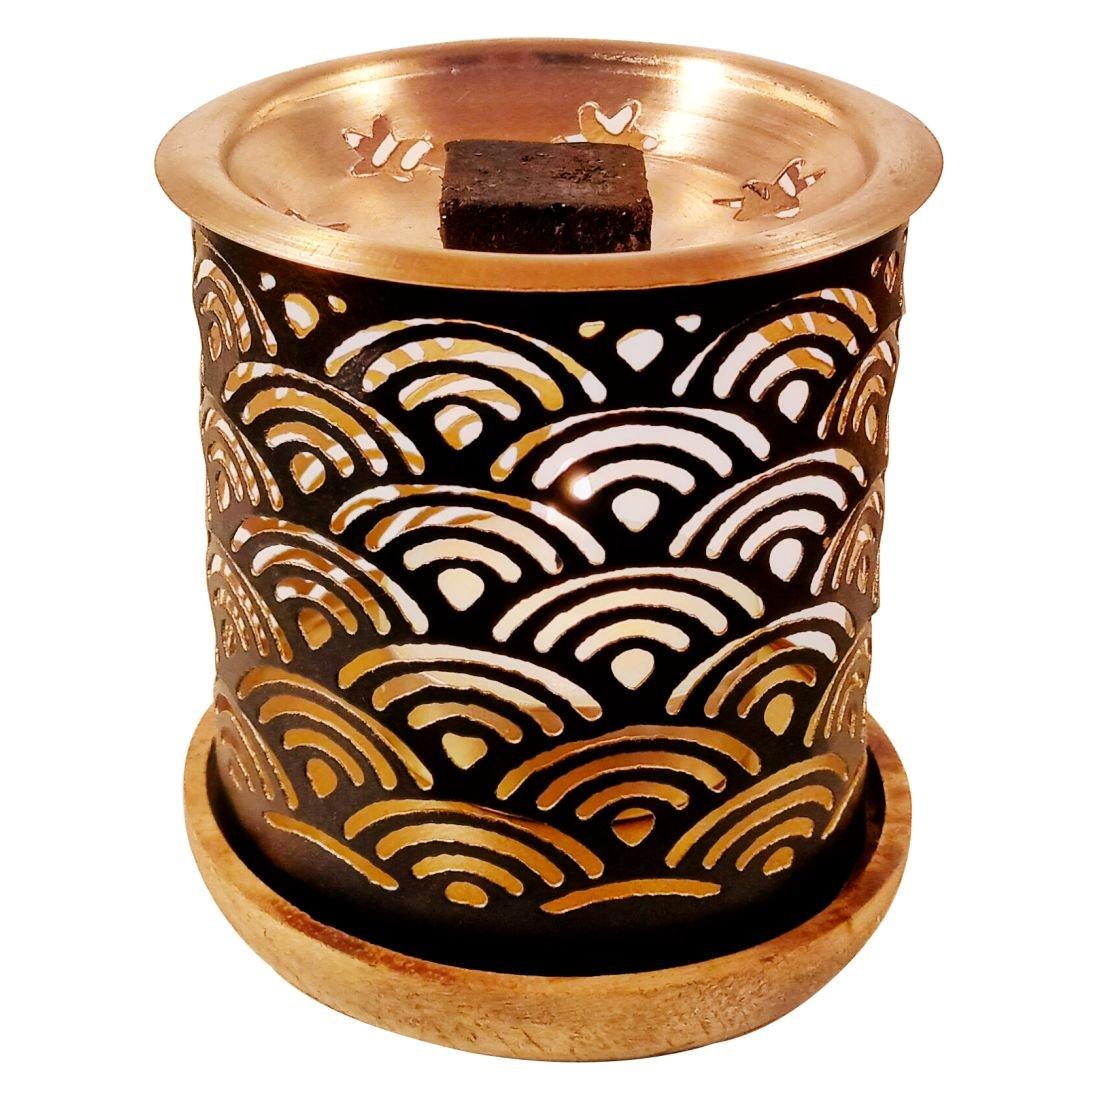 Dukhni Oud Bakhoor Incense Variety Box & Rainbow Bakhoor Burner - Gift Set & Starter Kit by Dukhni (Image #5)